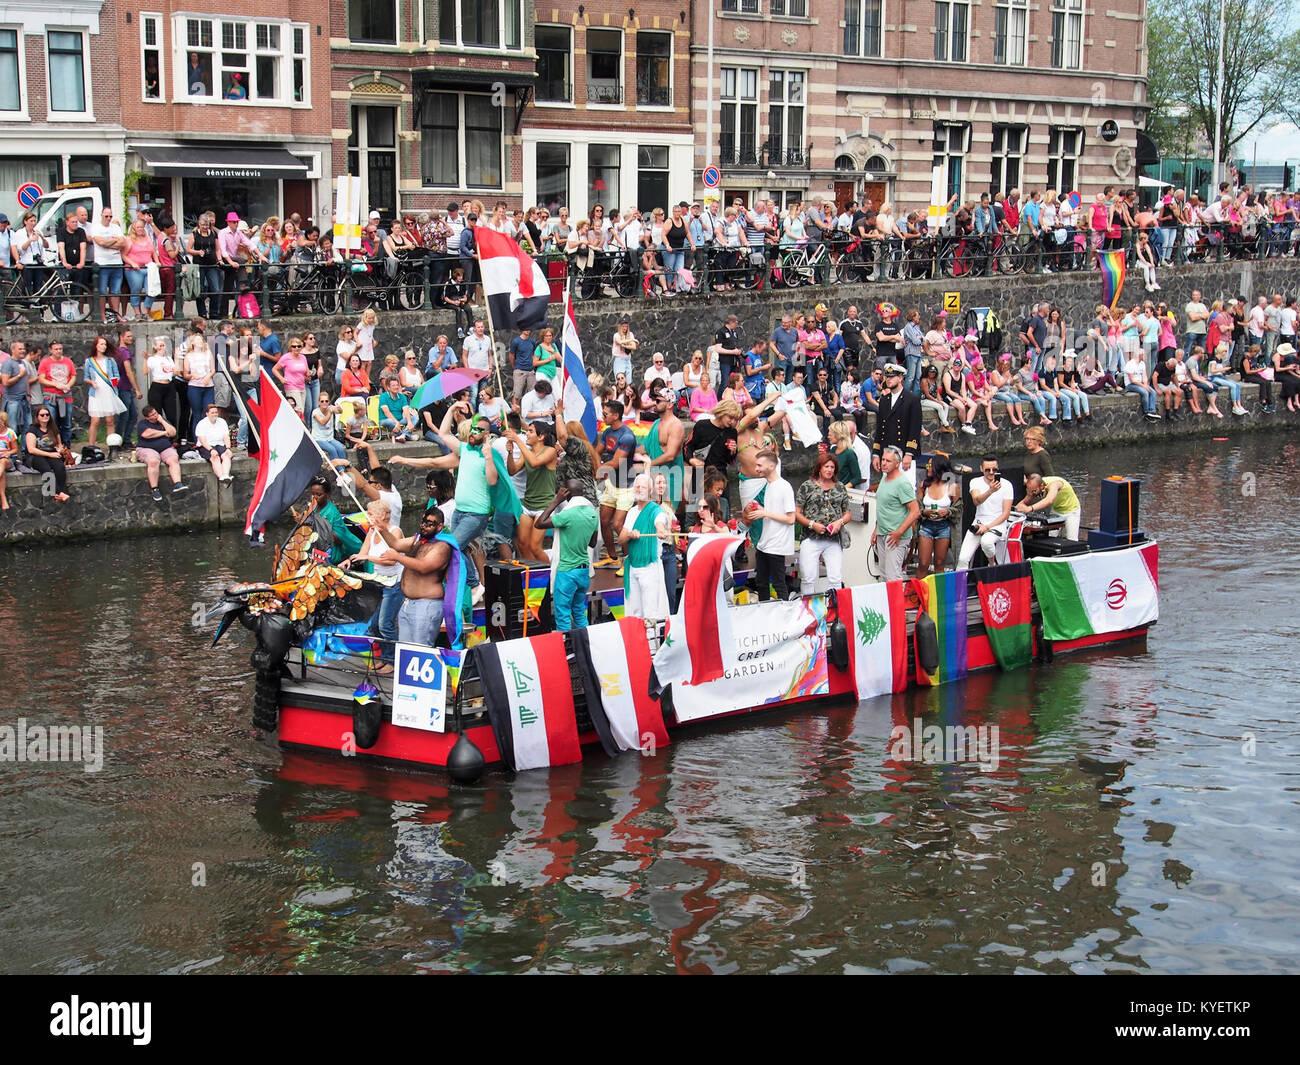 Boat 46 Stichting Secret Garden Canal Parade Amsterdam 2017 Foto 1